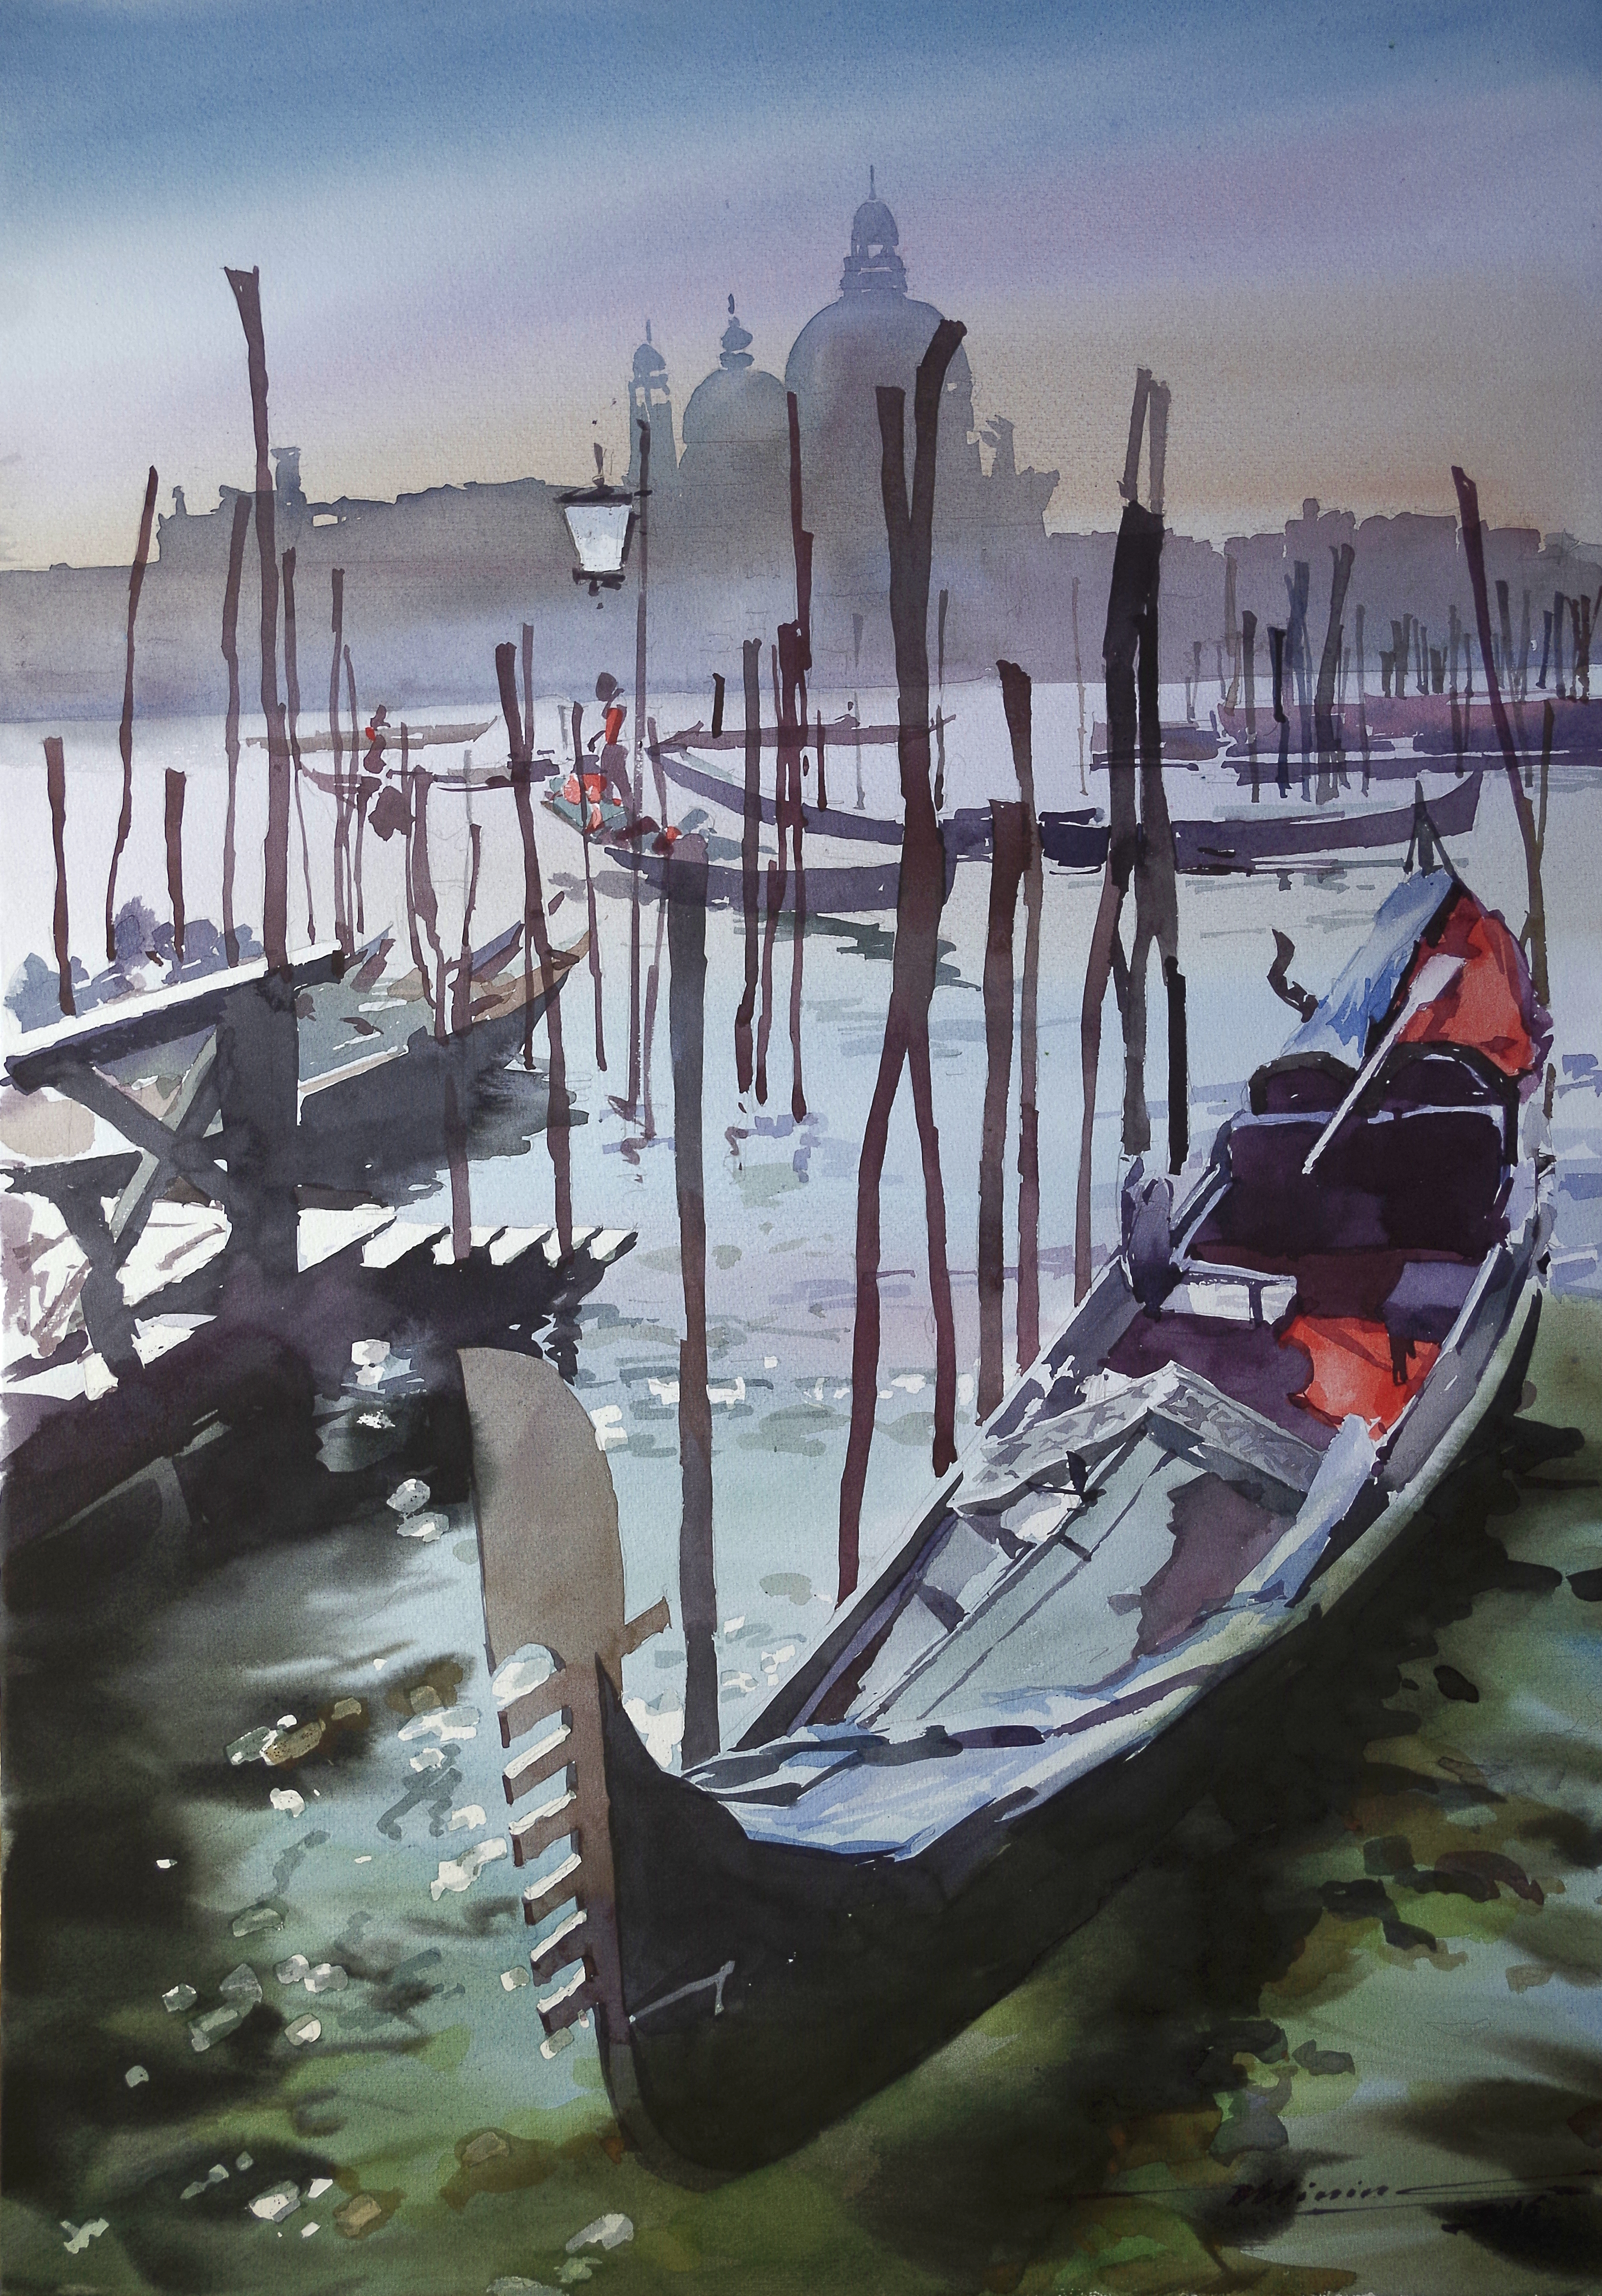 sergei-minin-marina-lady-ju-gallery-1